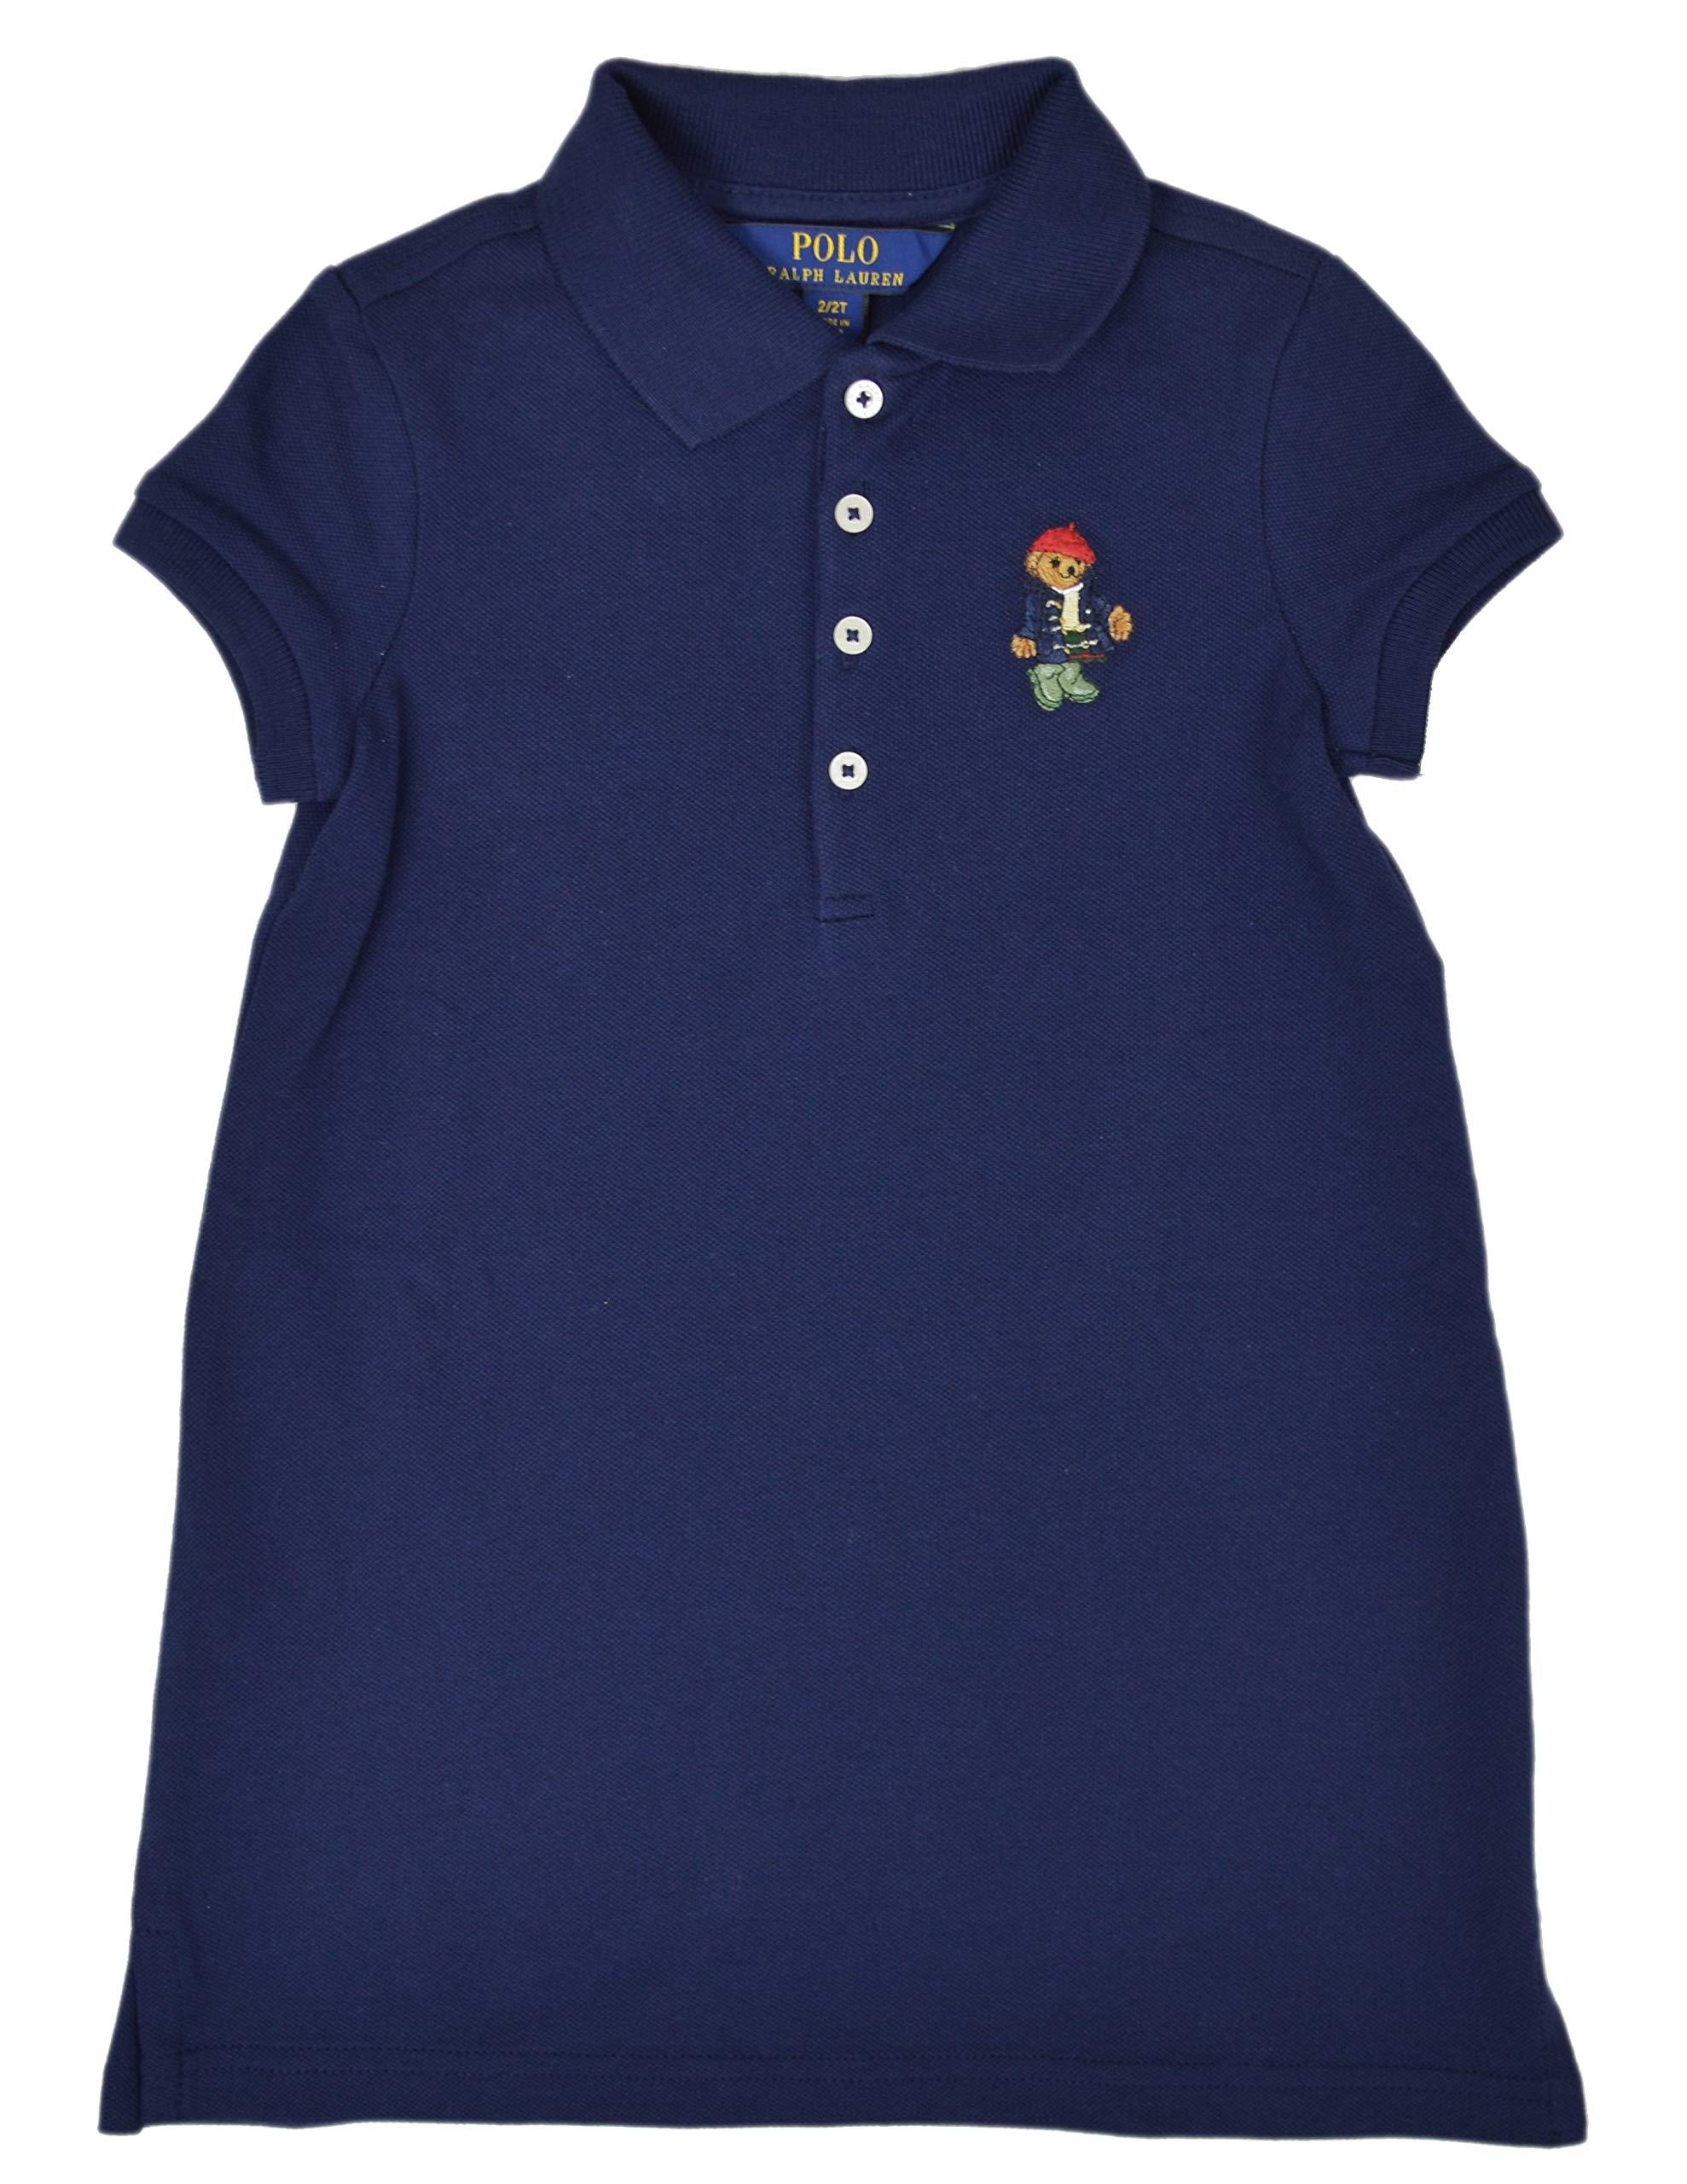 Polo Ralph Lauren Girl's Mesh Bear Logo Polo Shirt Short Sleeves, Navy (2/2T) (2/2T) by Polo Ralph Lauren (Image #1)